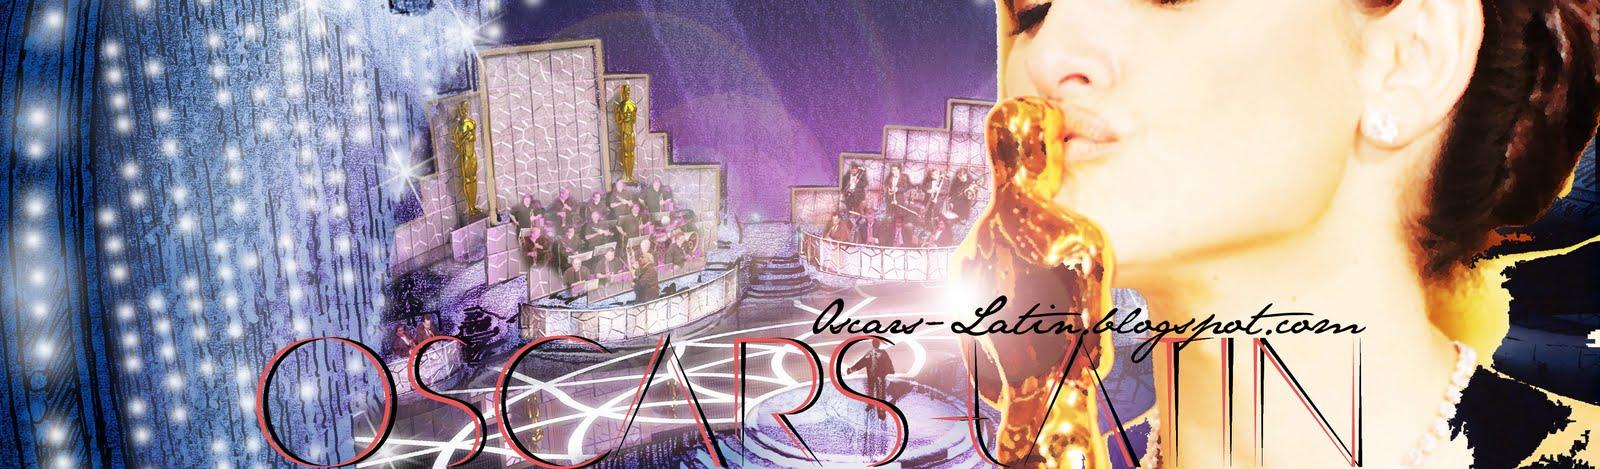 Oscars Latinos